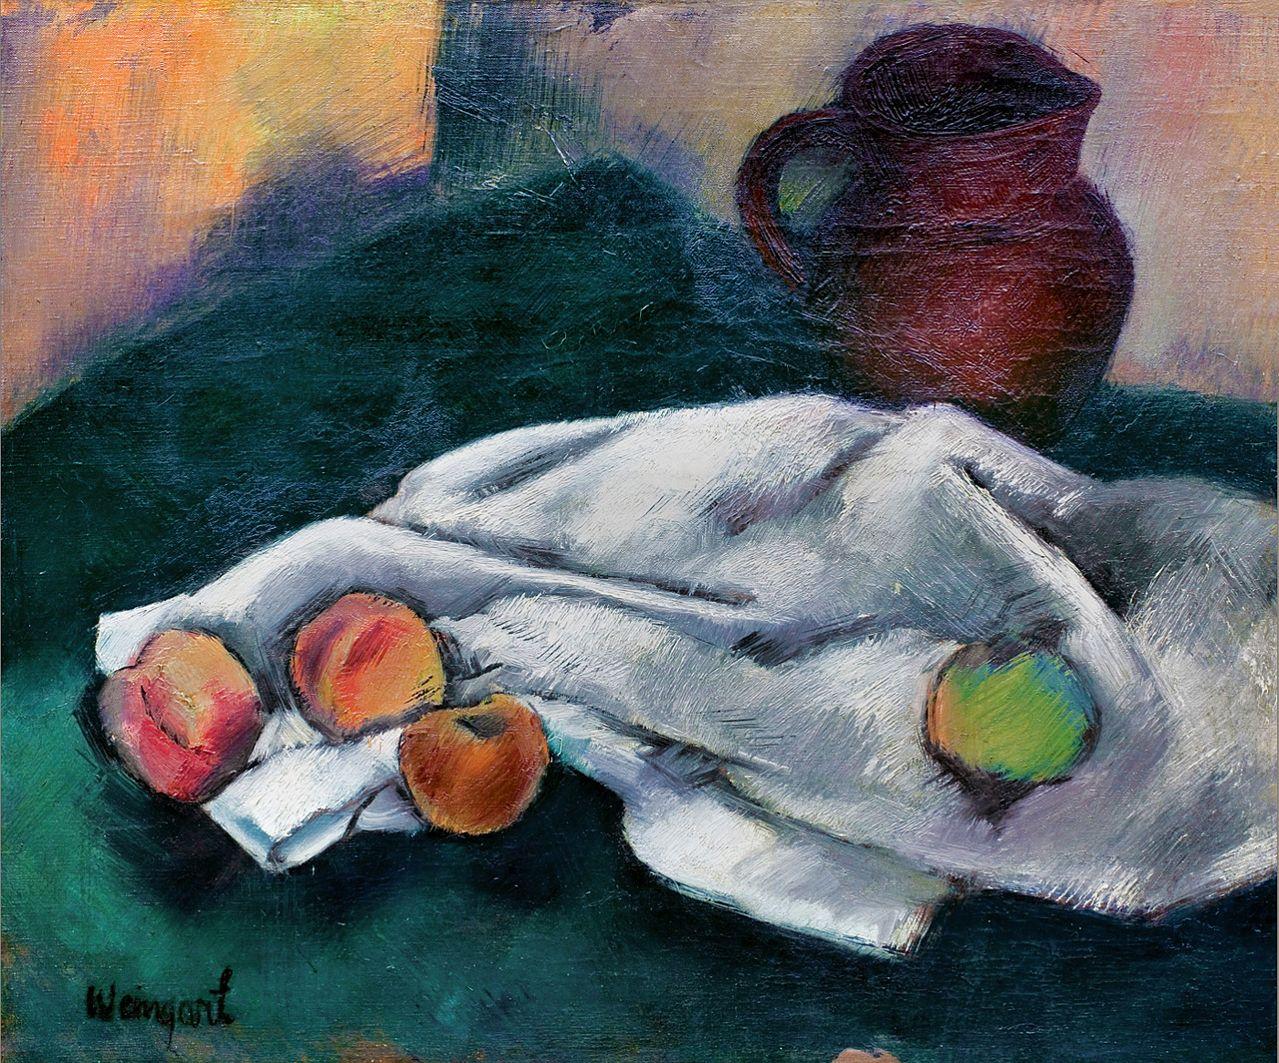 Йоахім Вайнгарт. Натюрморт, 1920